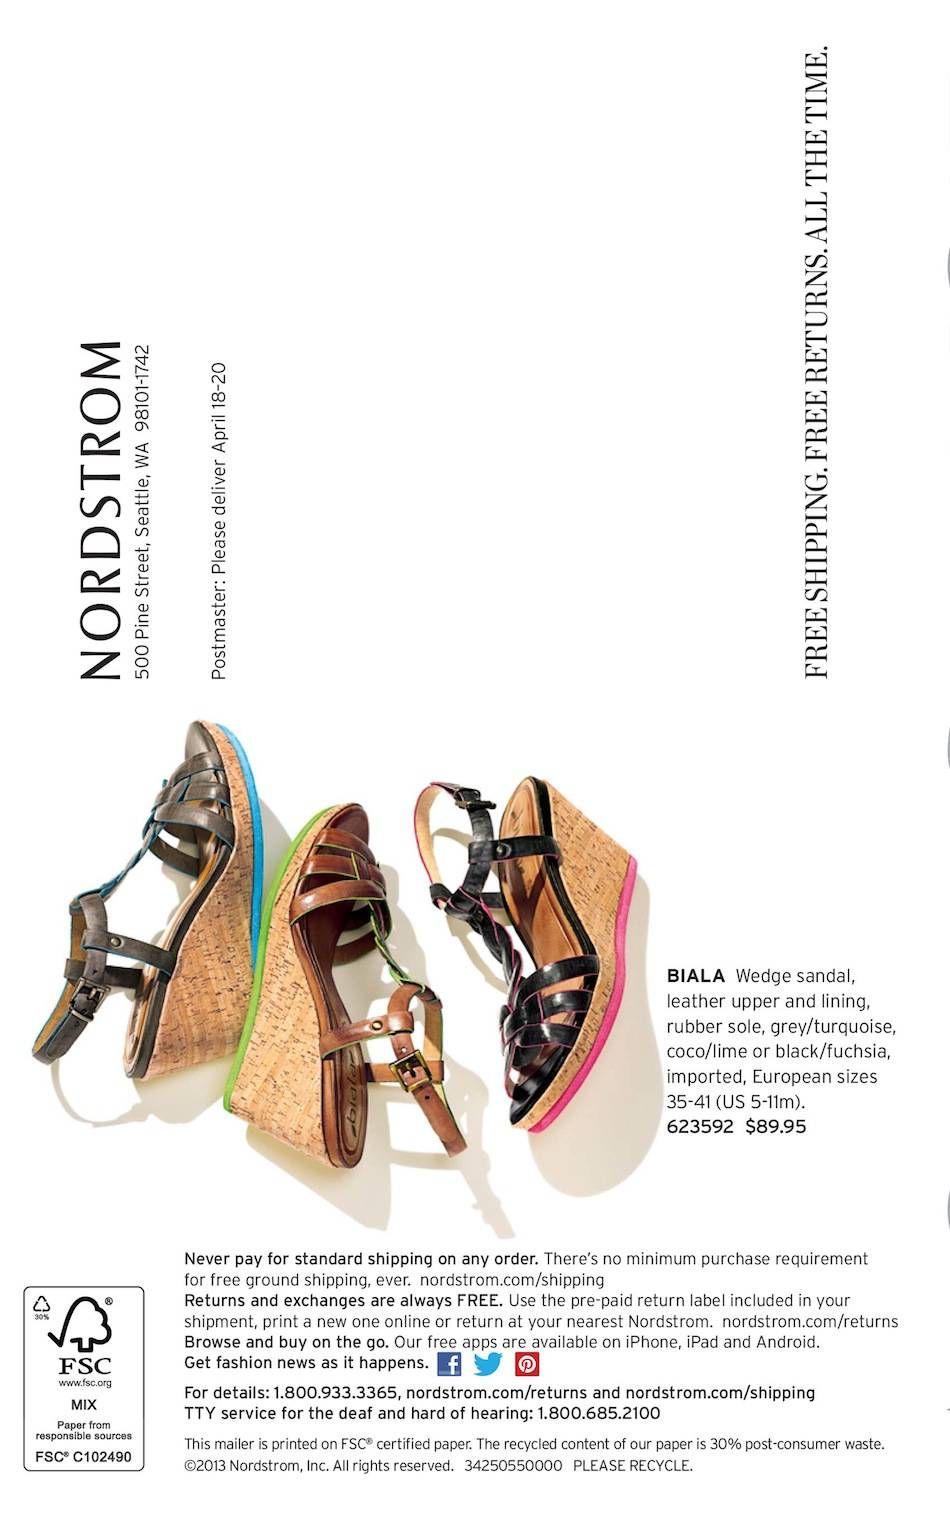 ebc8bef33 Nordstrom April 2013 Comfort Shoes Catalog   BonTon   Shoes ...